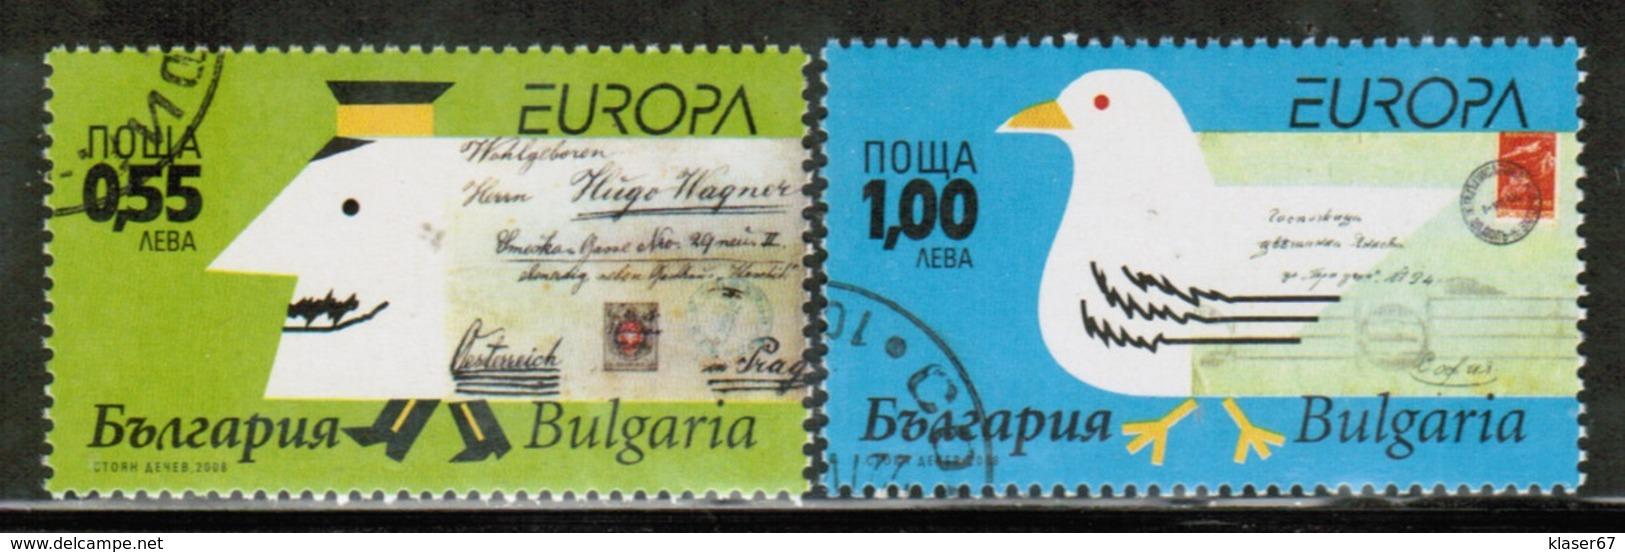 CEPT 2008 BG MI 4840-41 BULGARIA USED - 2008